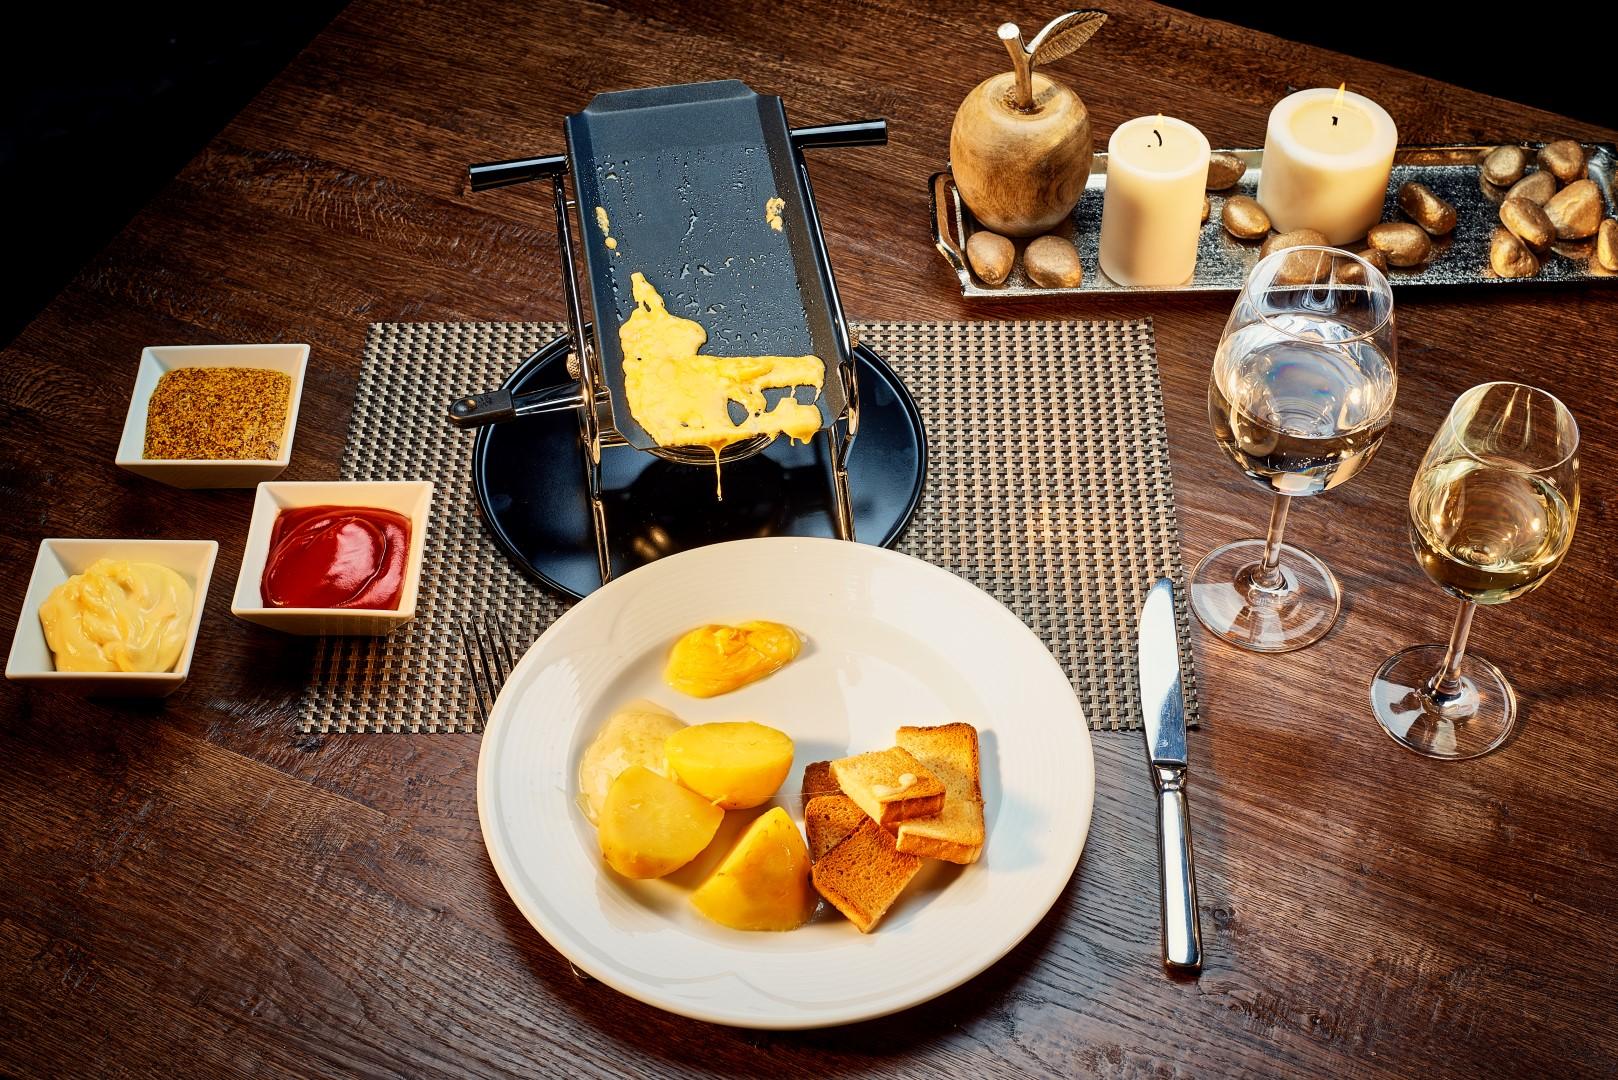 Raclette fondue special